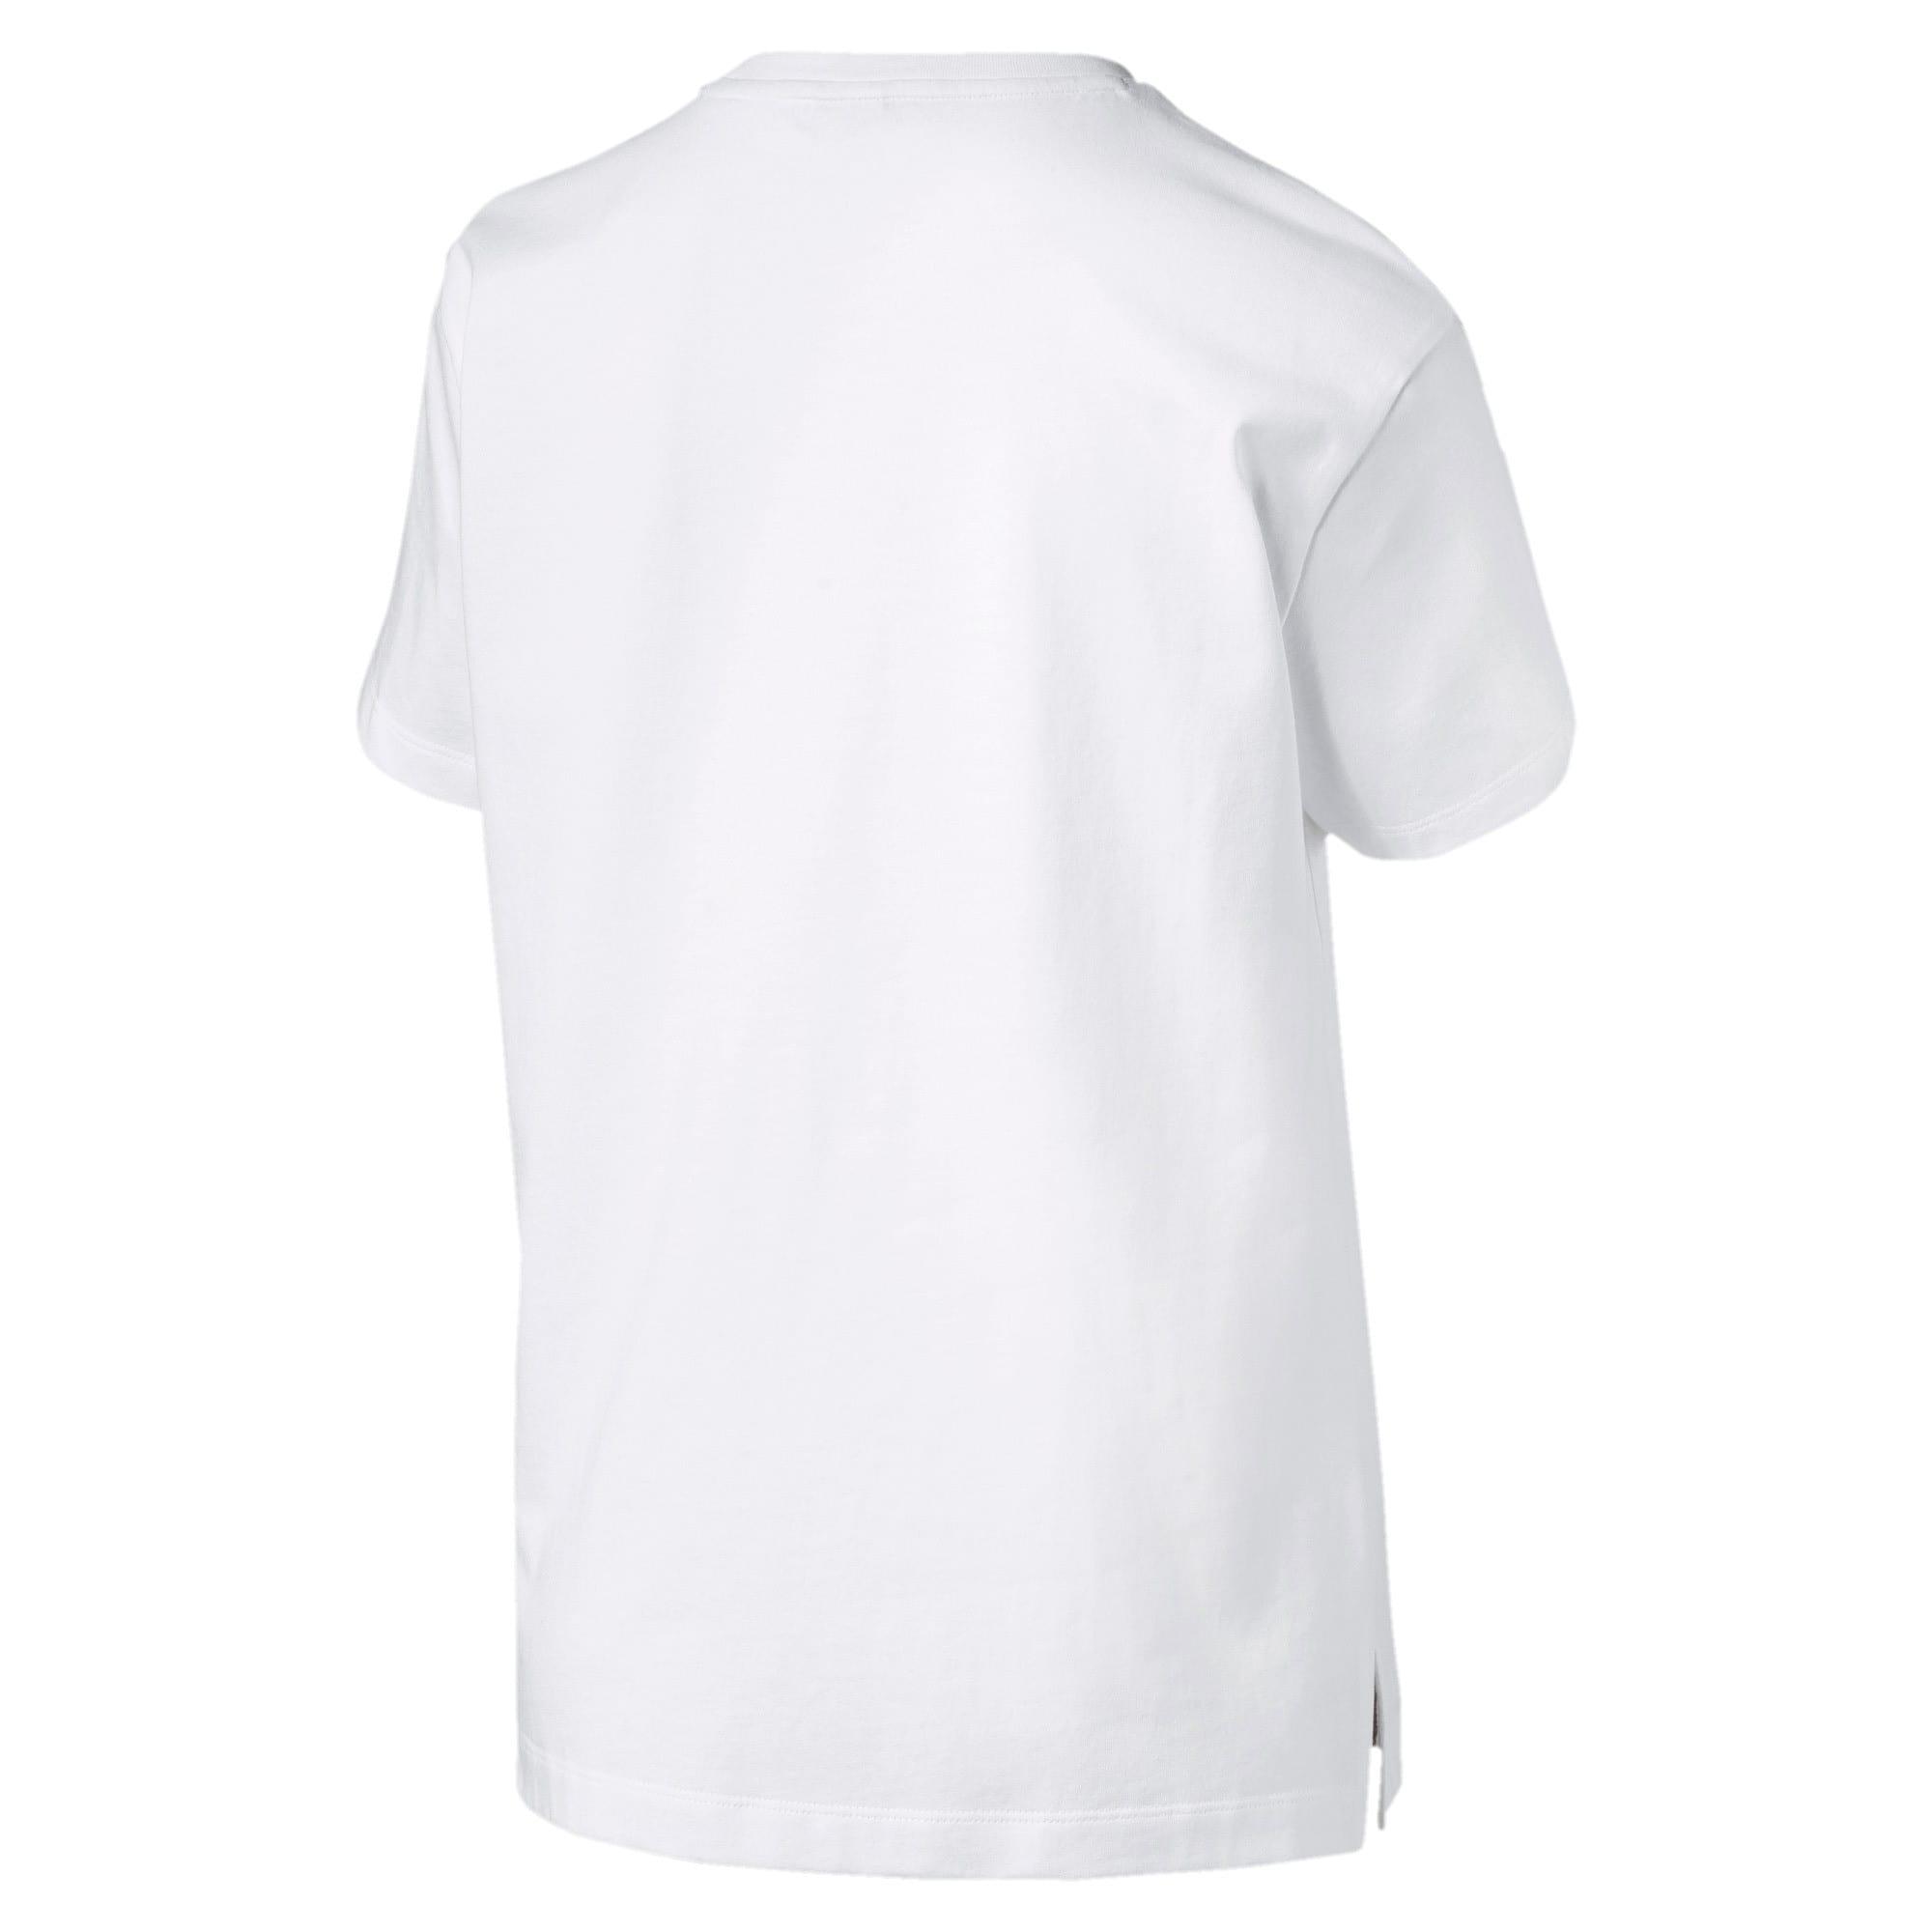 Thumbnail 4 of CLASSICS ロゴ ウィメンズ SS Tシャツ 半袖, Puma White-metal, medium-JPN